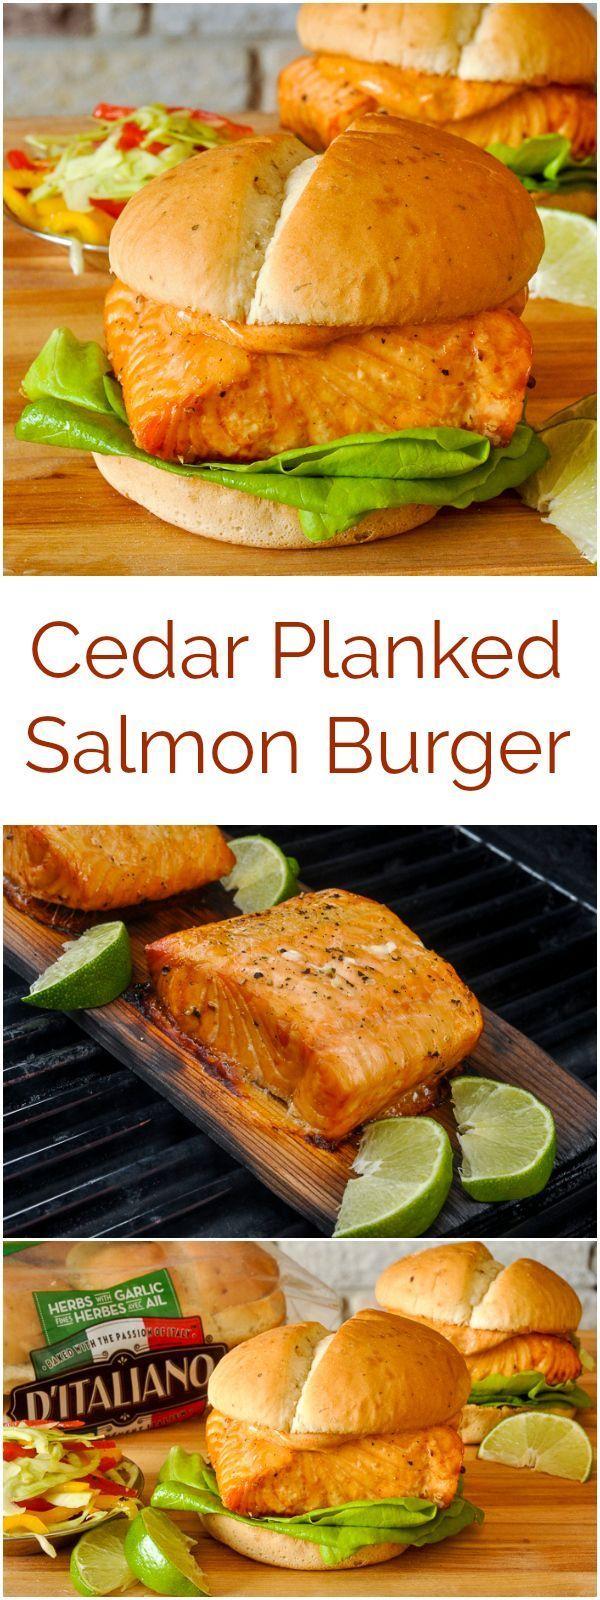 Cedar Planked Salmon Burger – Healthier eating made deliciously easy with cedar plank smoked salmon onD'Italiano Herb & Garlic Hamburger Buns. #sponsored